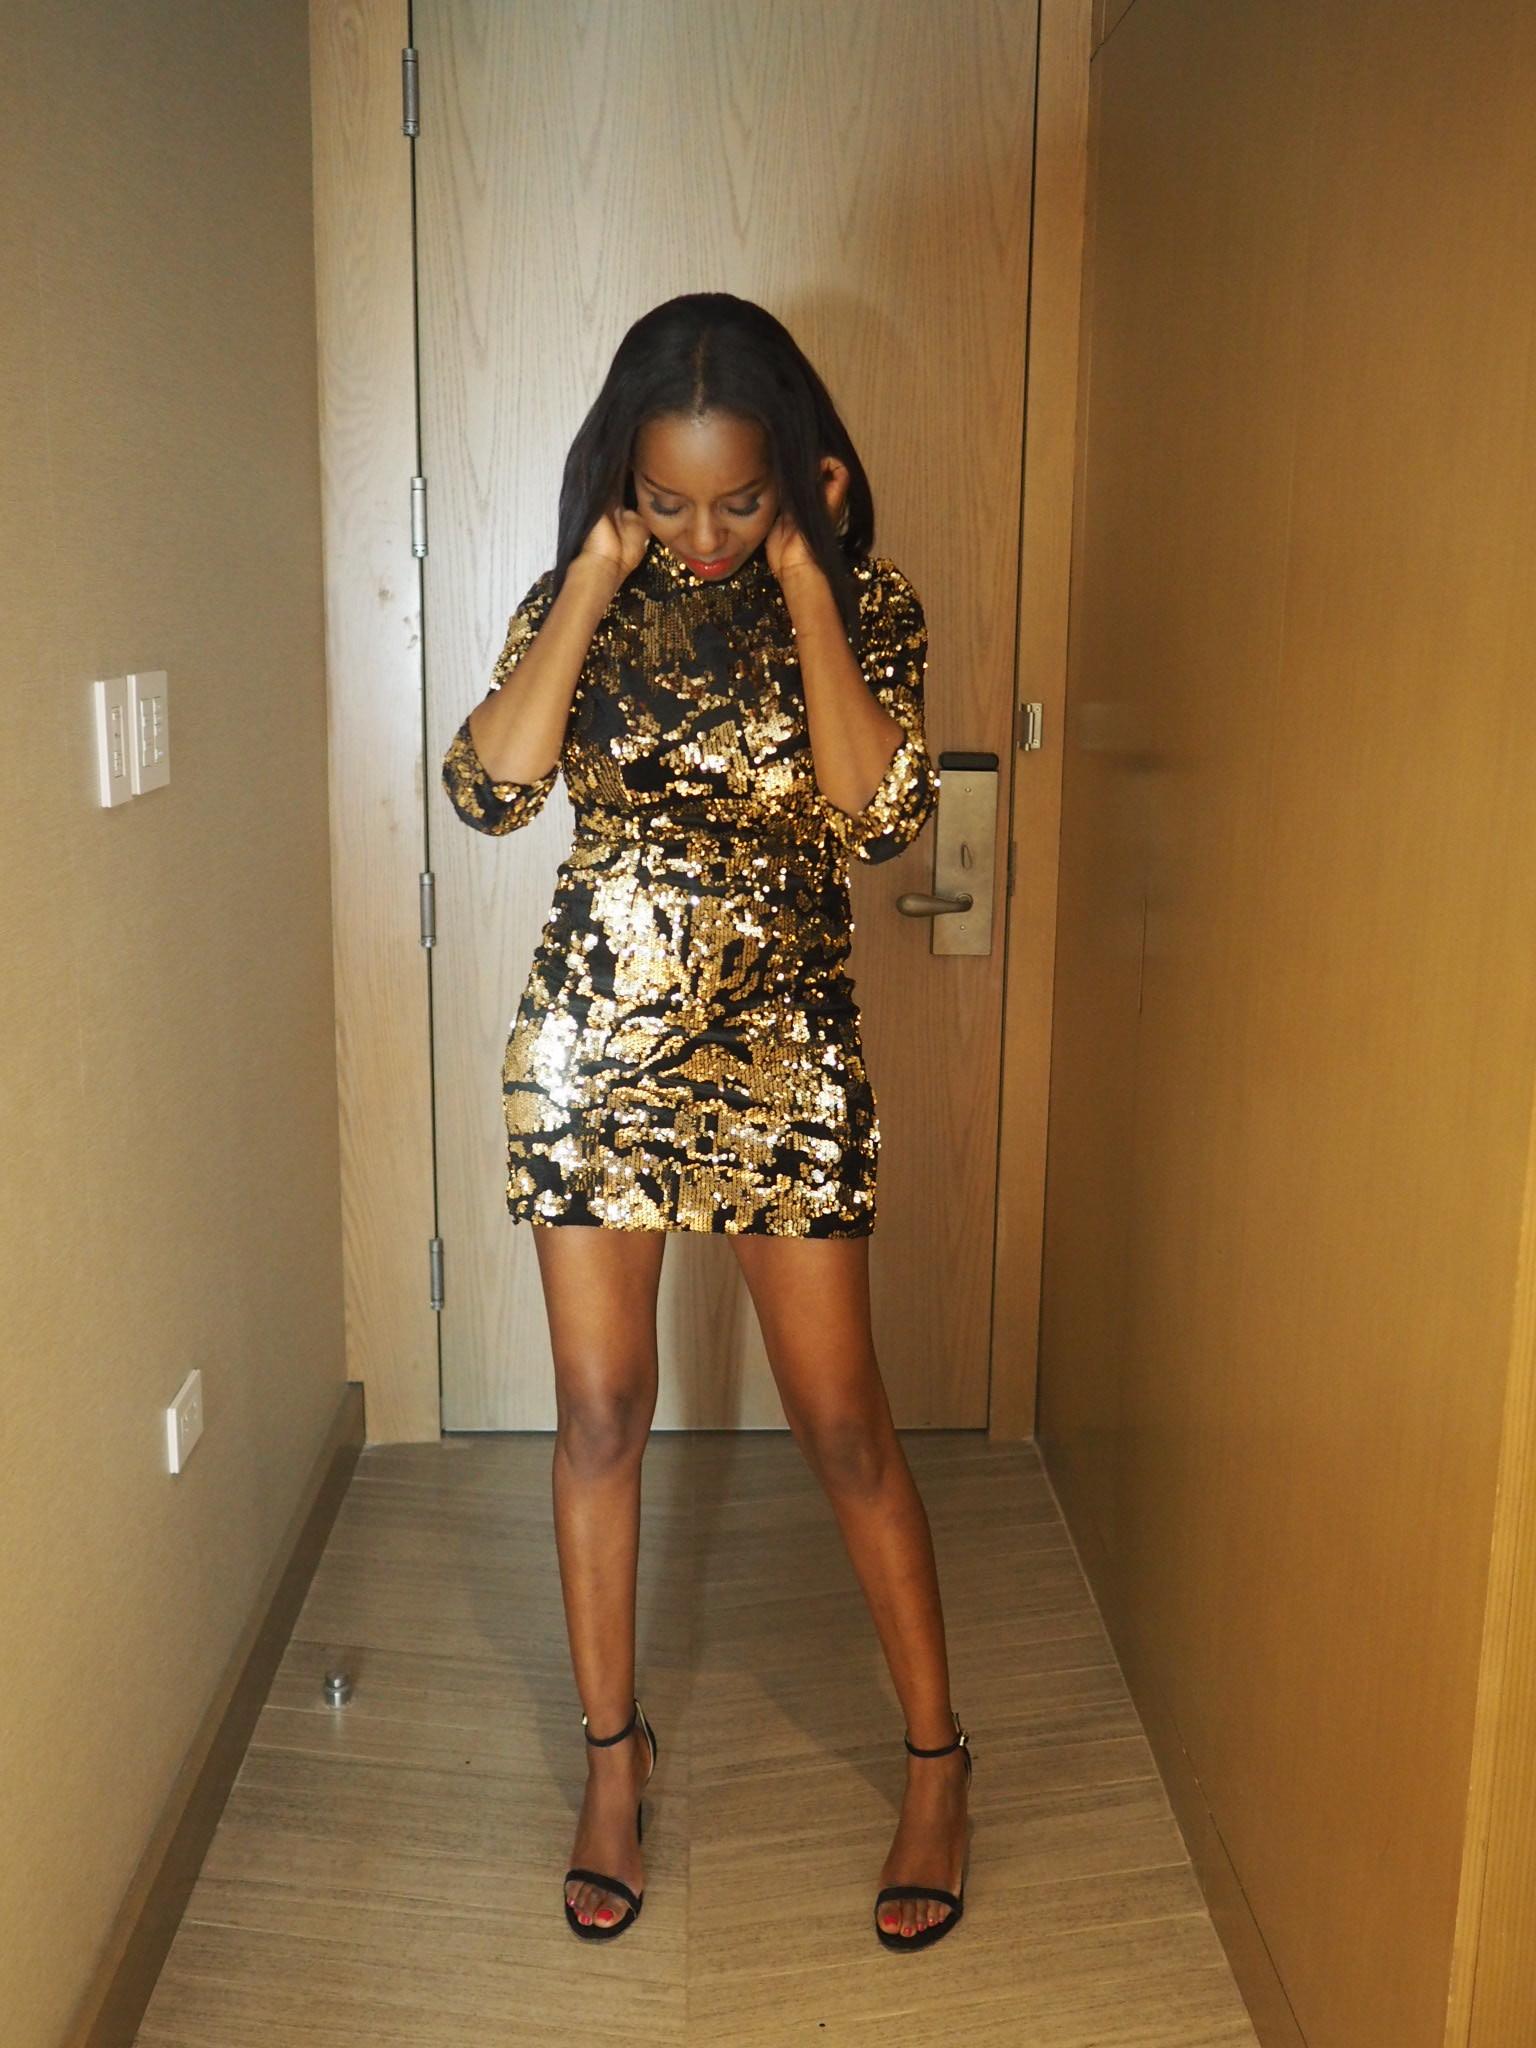 Zara Gold Sequin Dress, Sam Edelman Shoes, Centre Part Bob Hairstyle